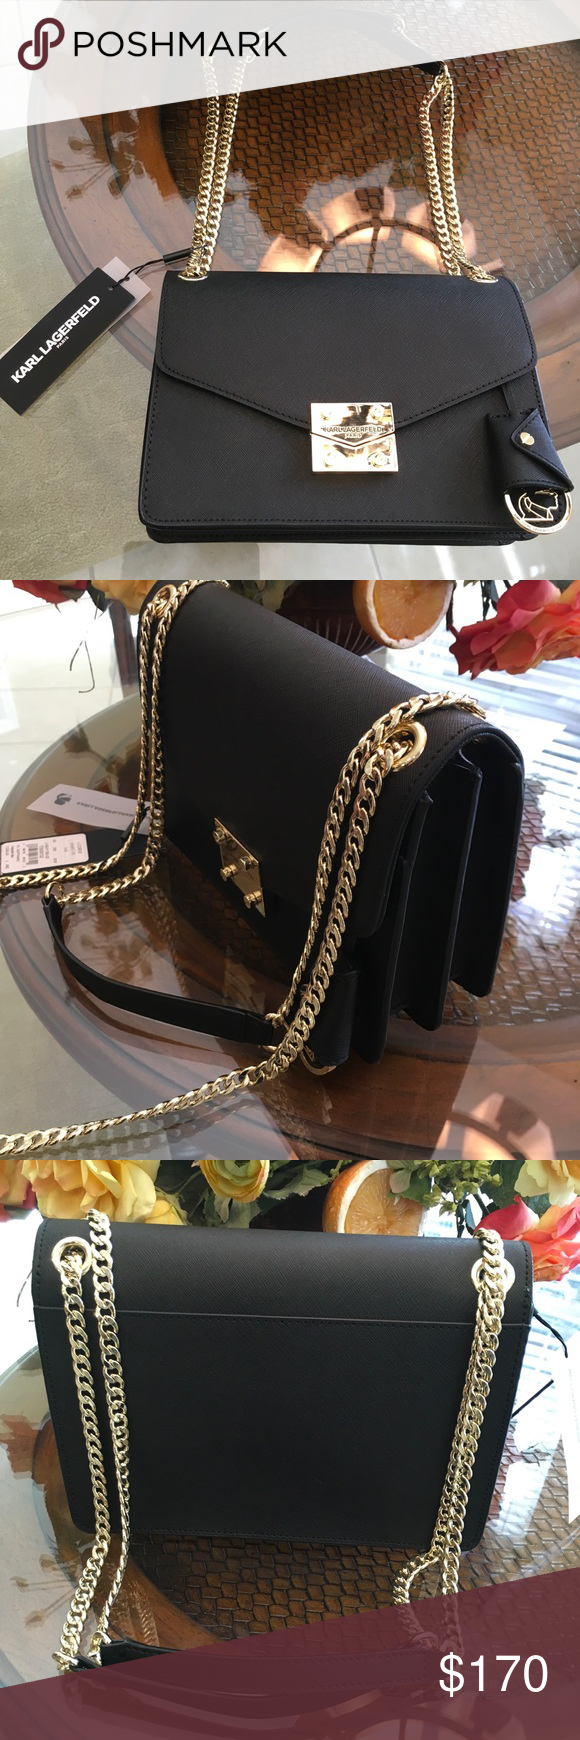 5230fd689b23 Karl Lagerfeld Corrine Saffiano Leath Shoulder Bag Karl Lagerfeld Paris